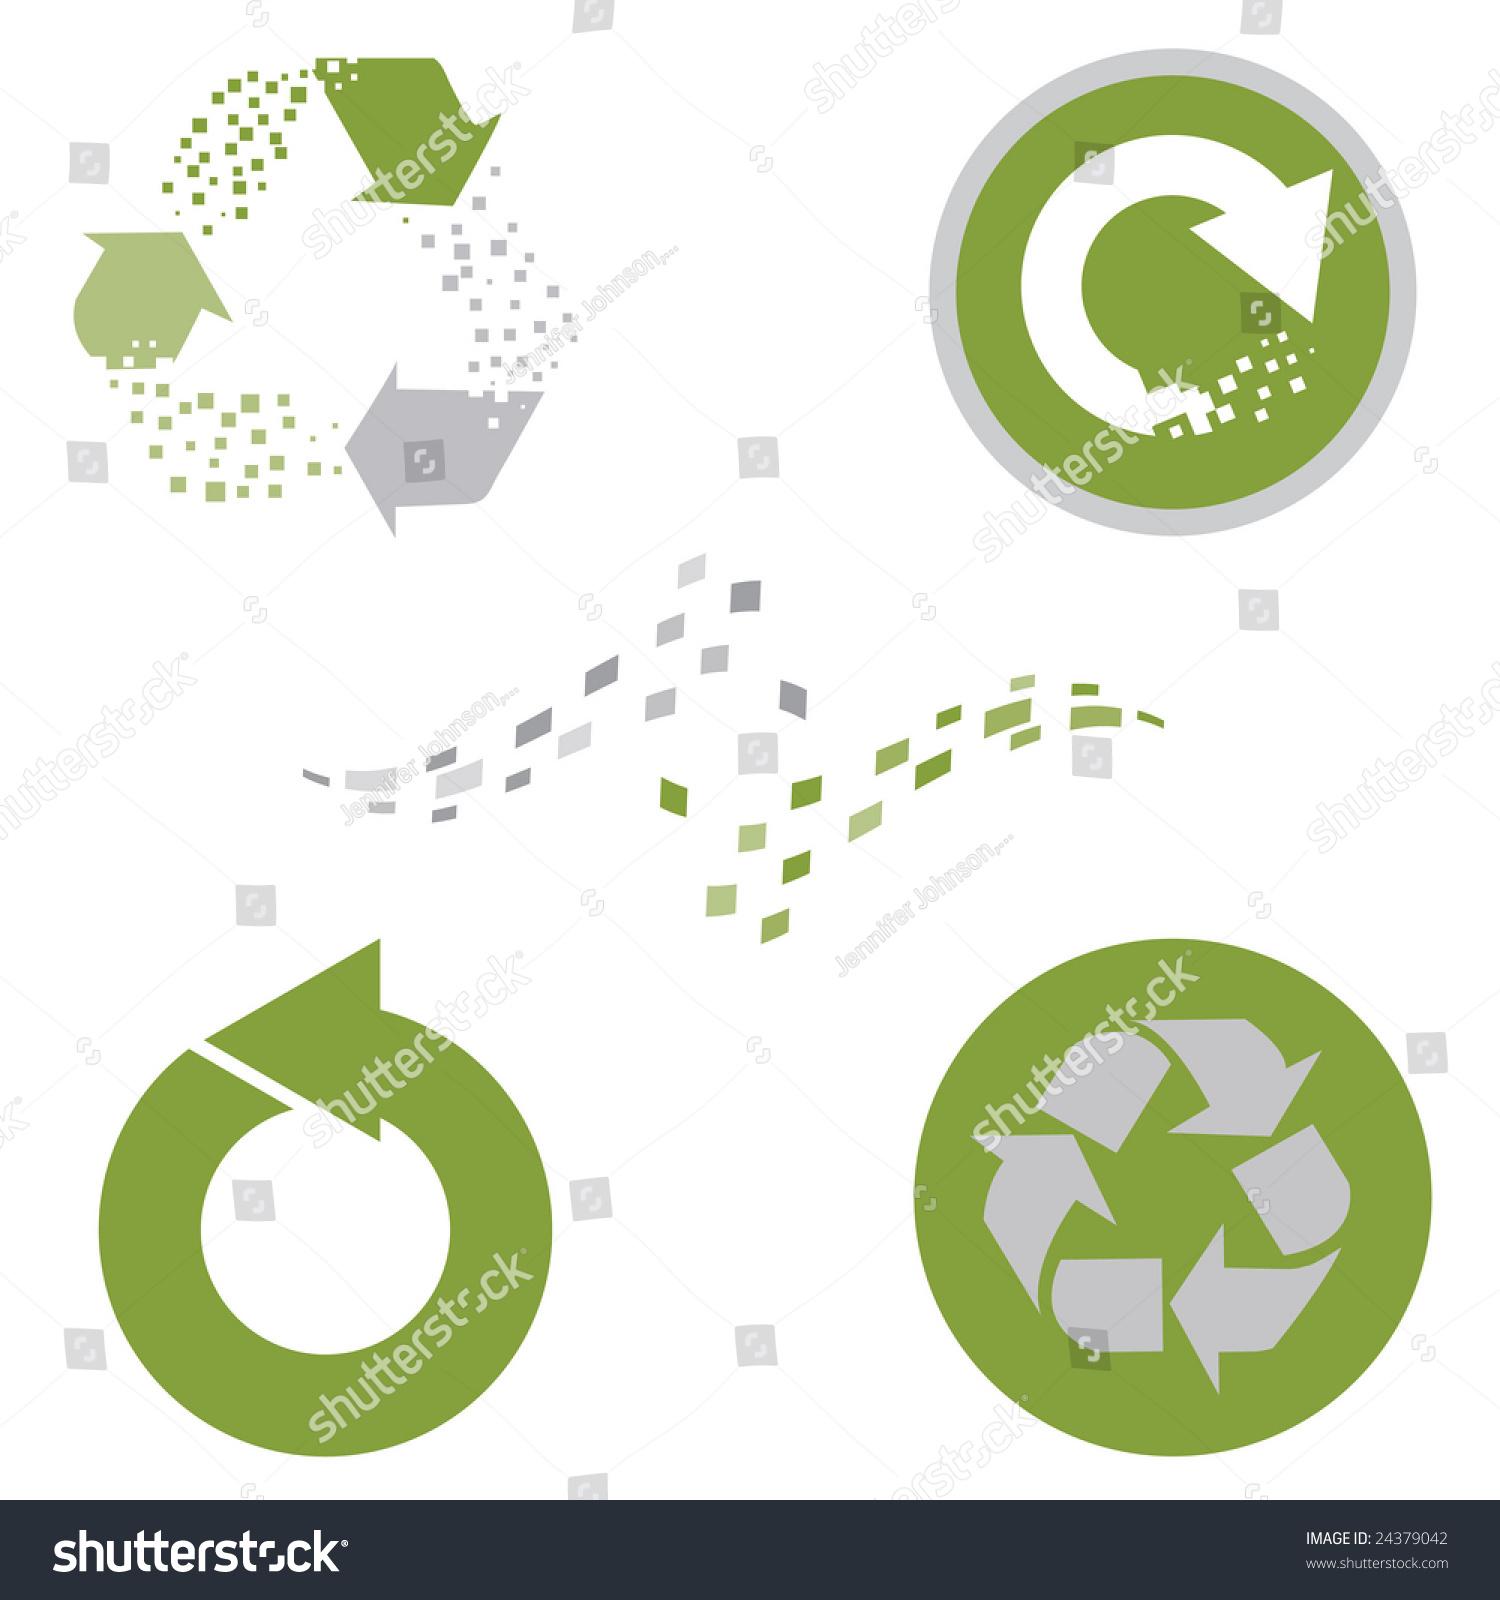 Set recycling symbols data electronic elements stock illustration set of recycling symbols with data electronic elements biocorpaavc